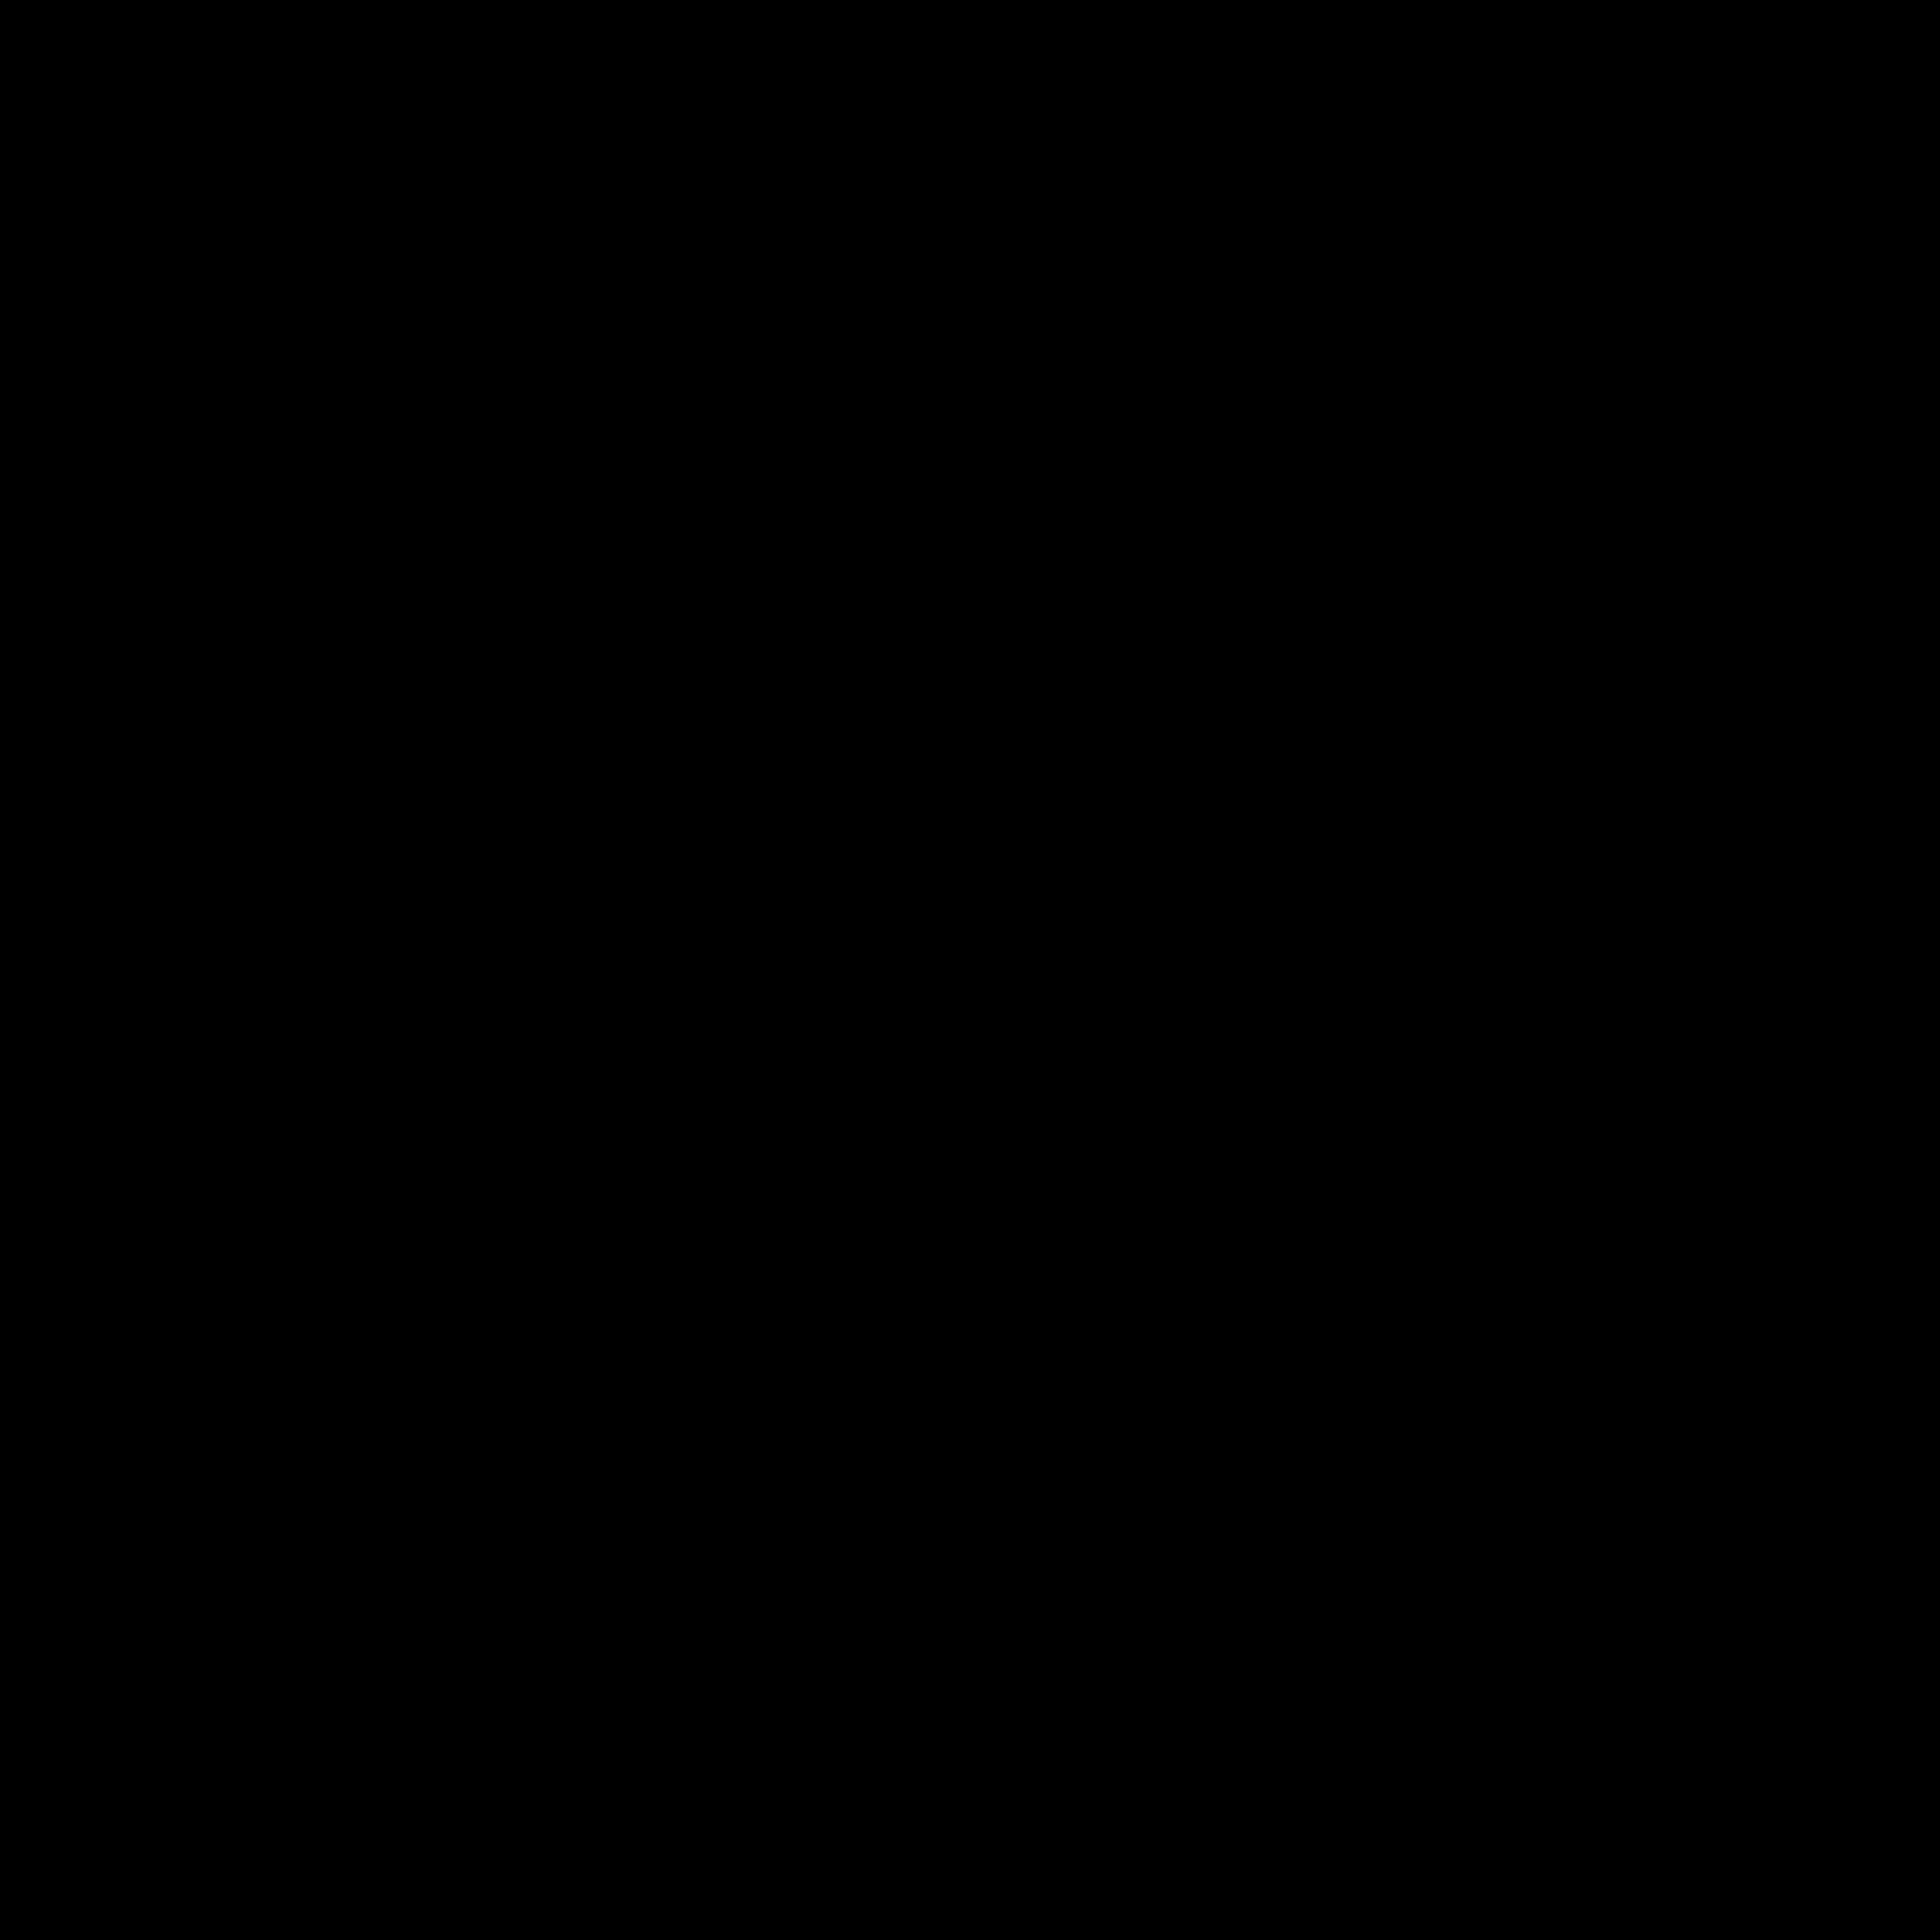 logo_sigil_4pg.png